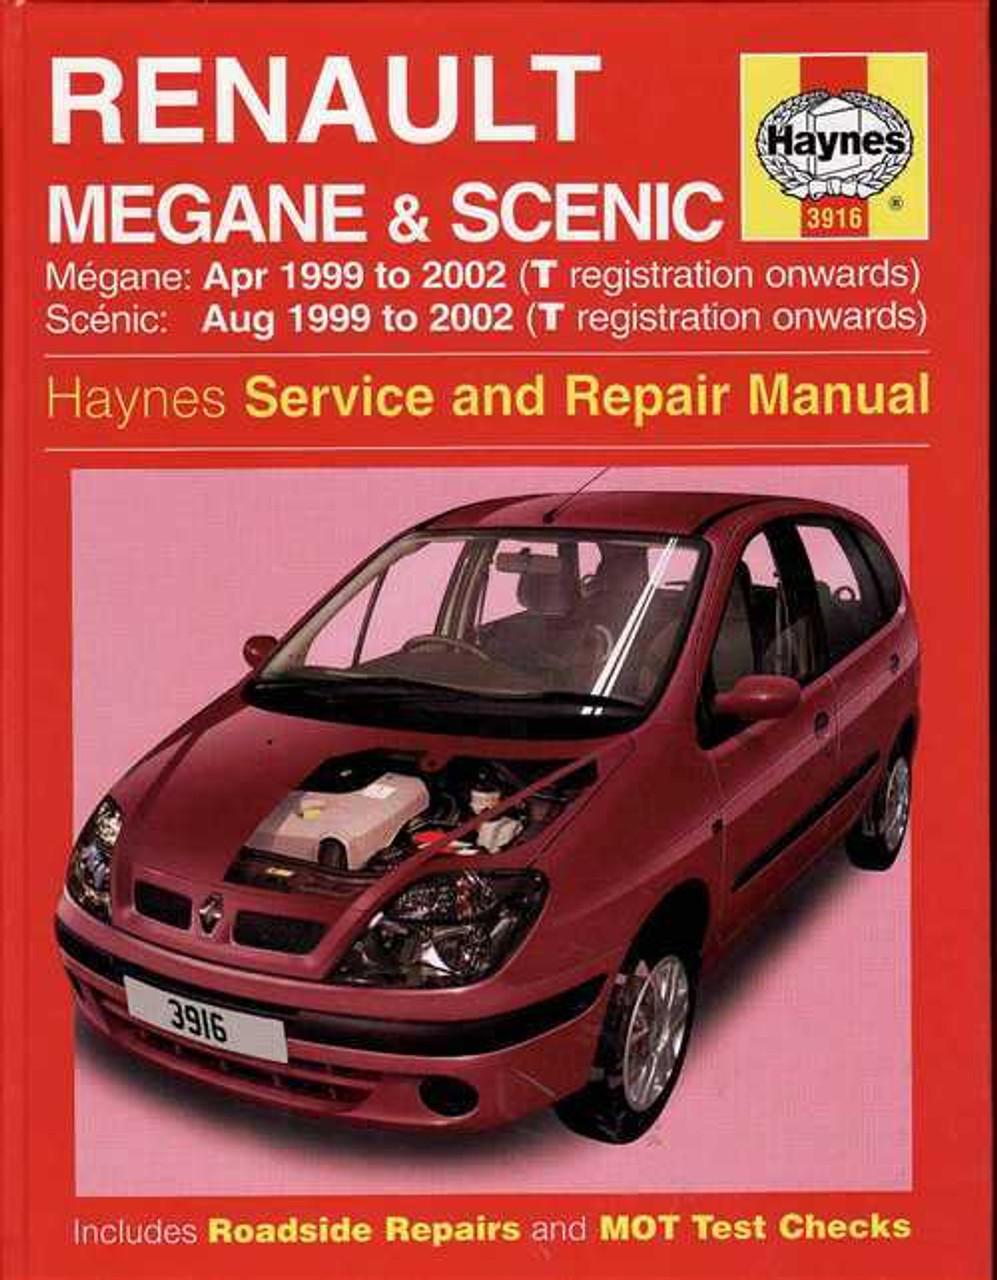 renault megane amp scenic 1999 2002 workshop manual rh automotobookshop com au renault megane cc workshop manual renault megane cabriolet workshop manual